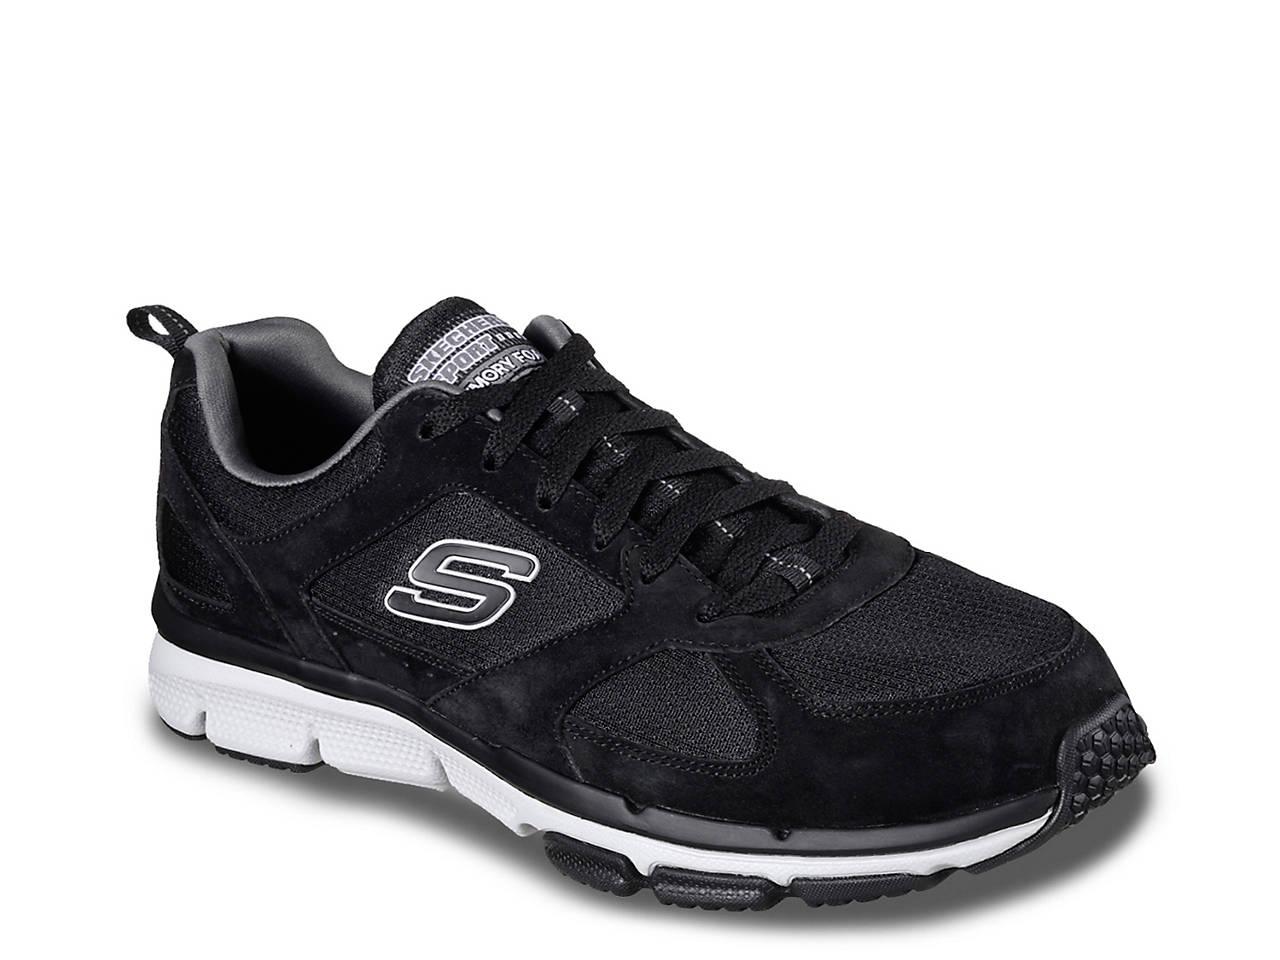 2d289bda15cf Skechers Relaxed Fit Optimizer Sneaker Men s Shoes